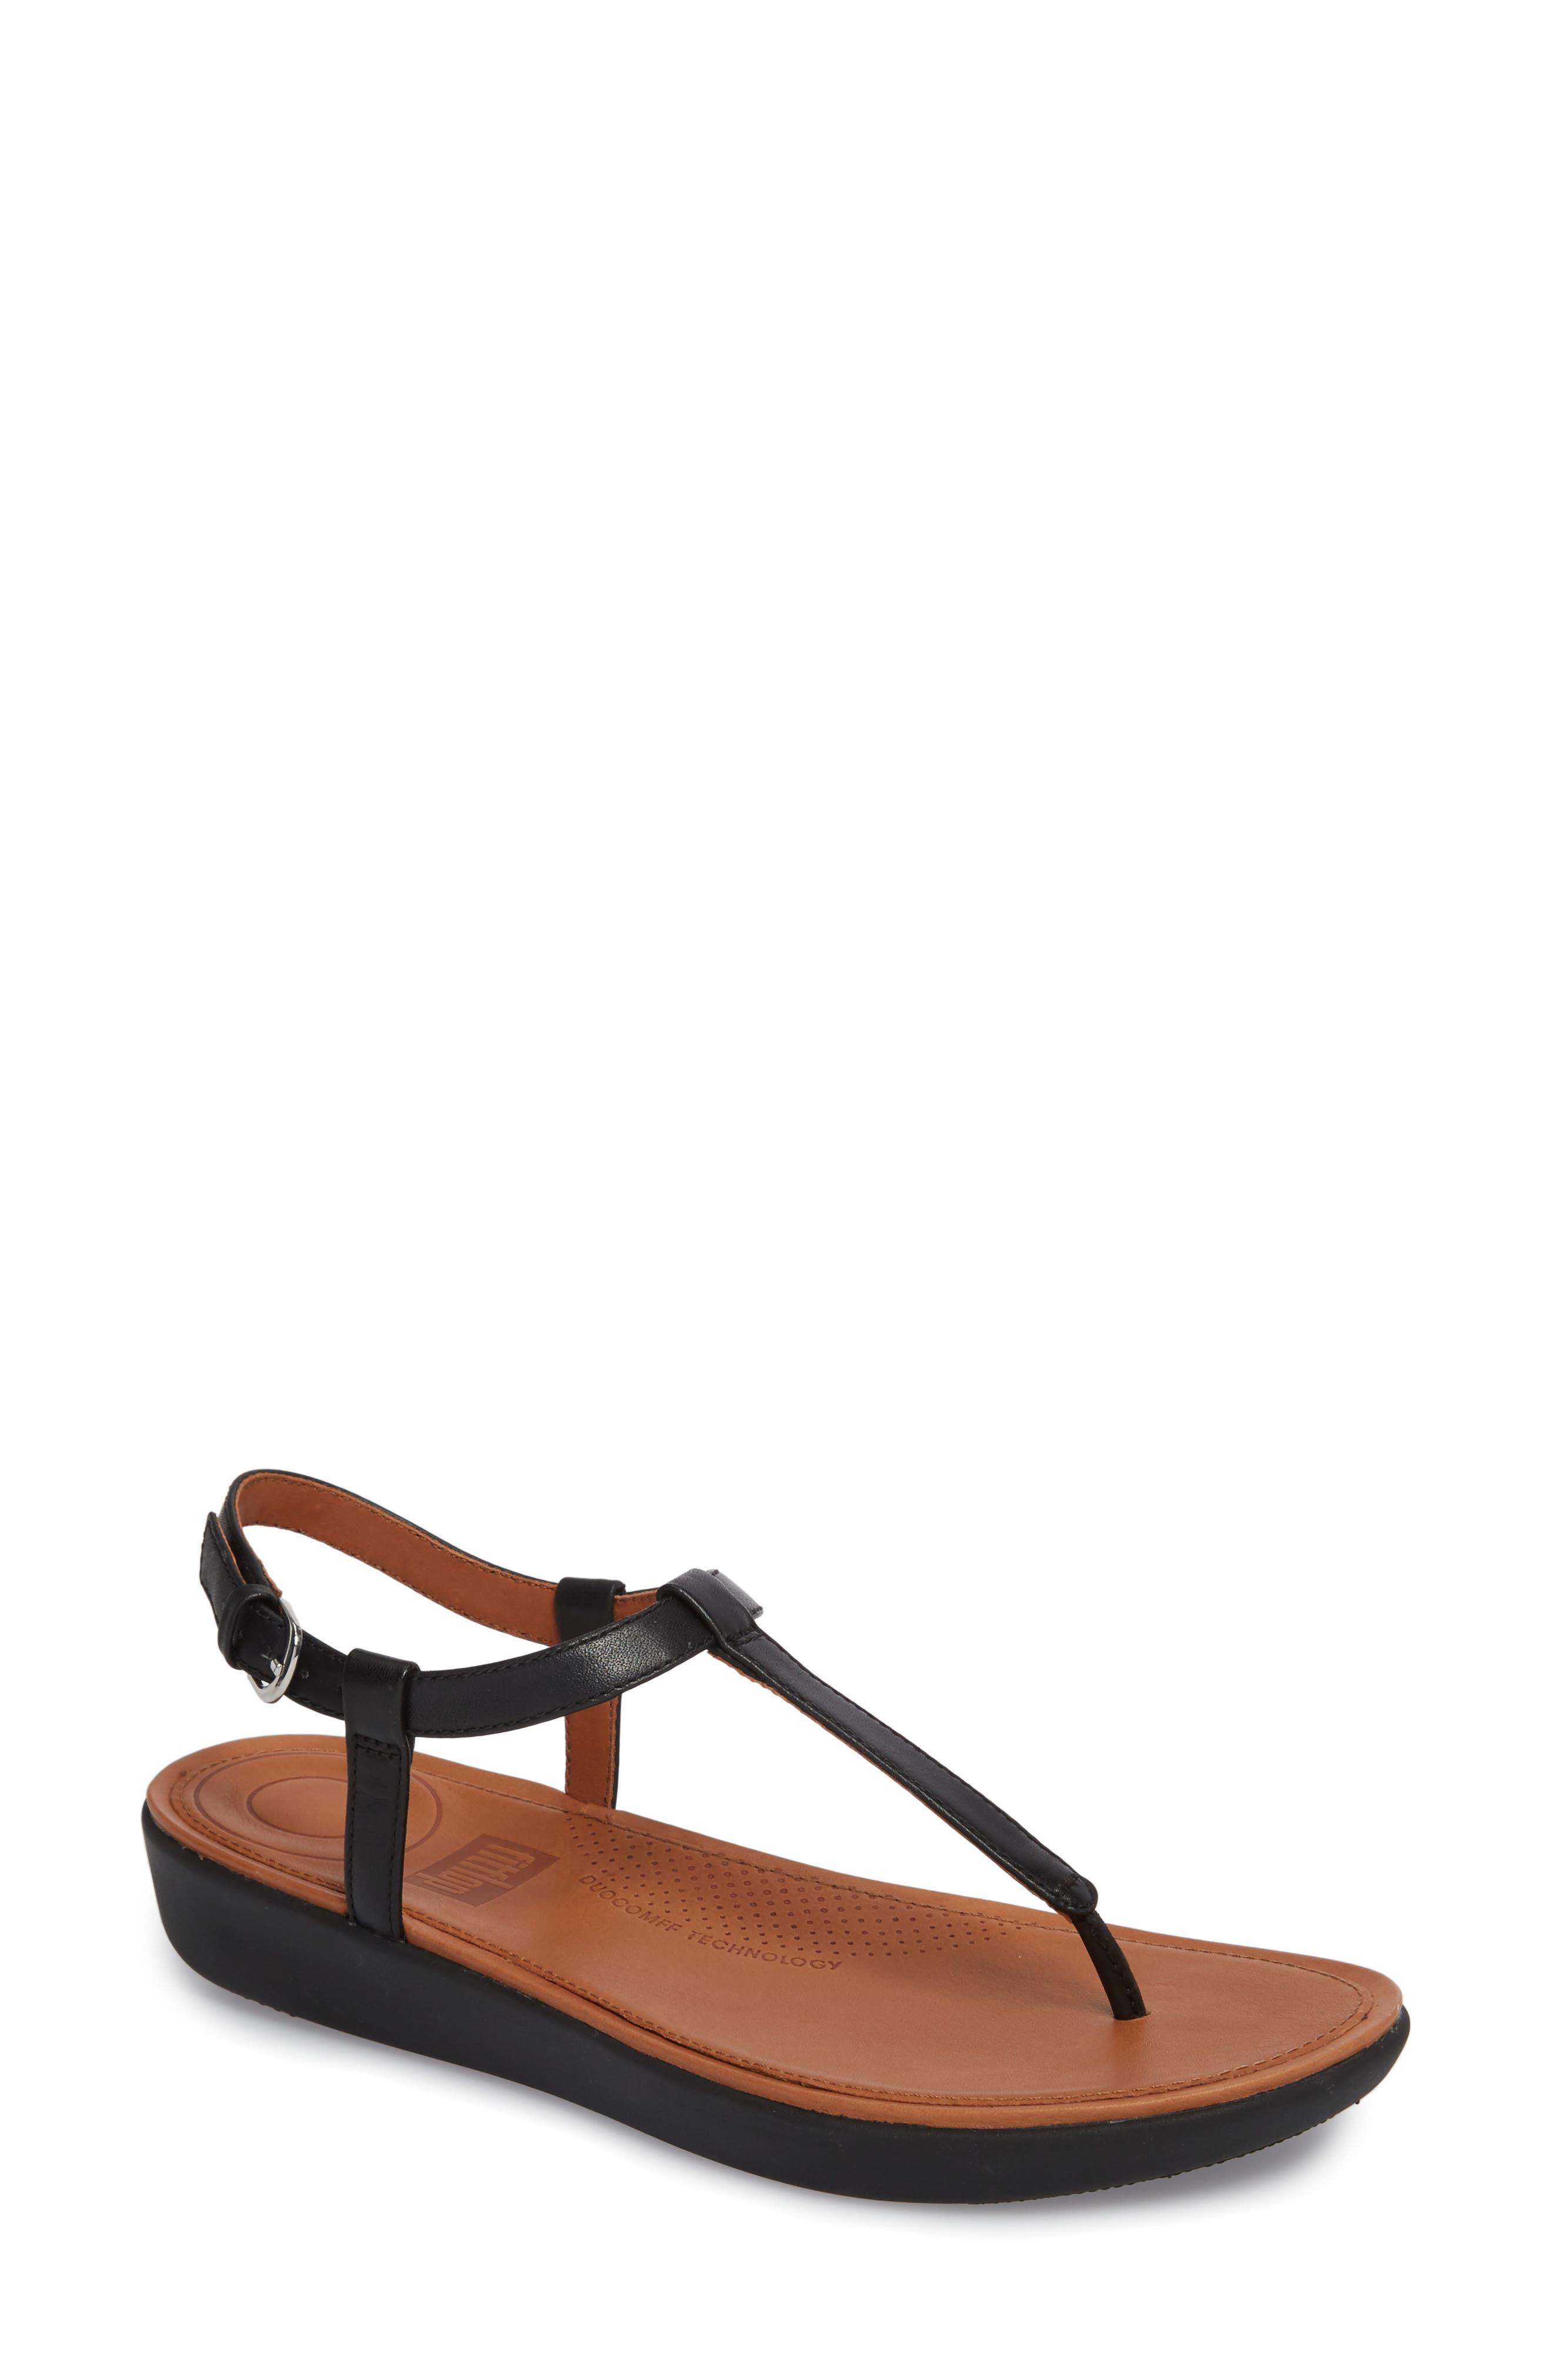 Tia Thong Sandal,                             Main thumbnail 1, color,                             Black Leather